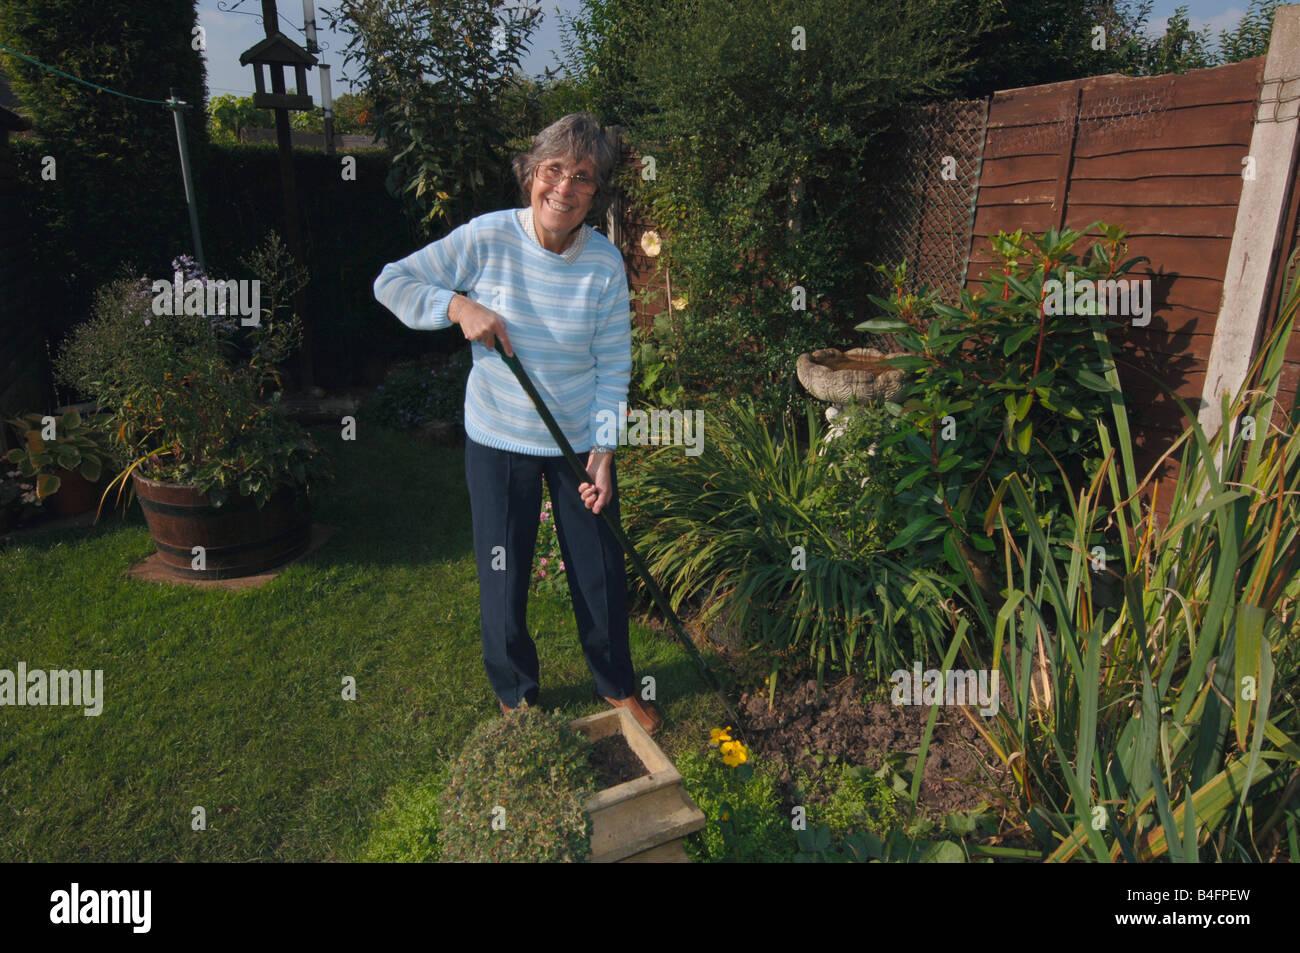 A Woman In Her Seventies Hoeing Her Garden - Stock Image